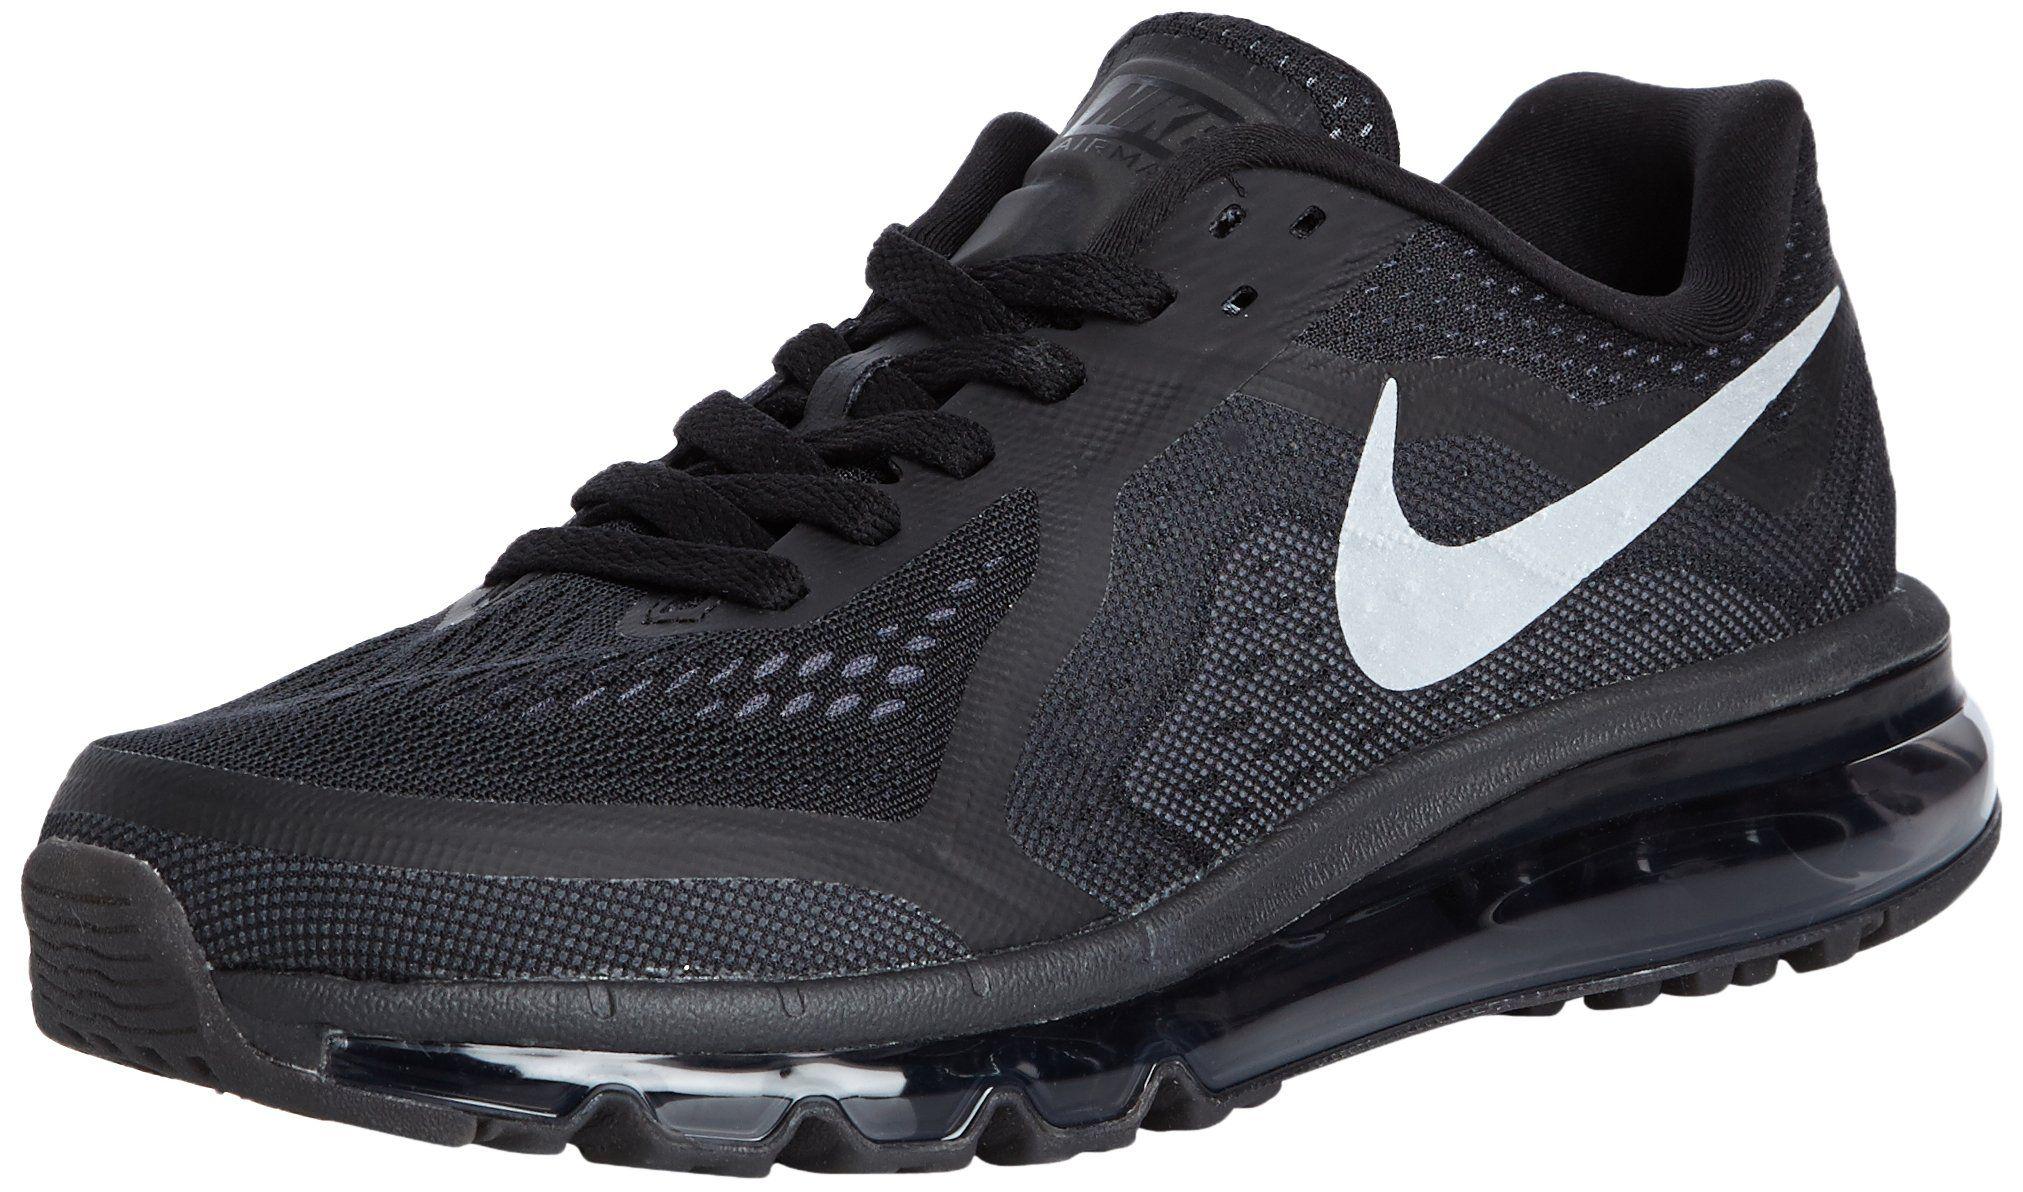 Gracioso Catedral Grave  Nike Air Max 2014 Men Sneaker Black/Anthracite/Dark Grey/Reflect Silver  621077-001 (10 D(M) US) | Nike, Nike men, Nike free shoes